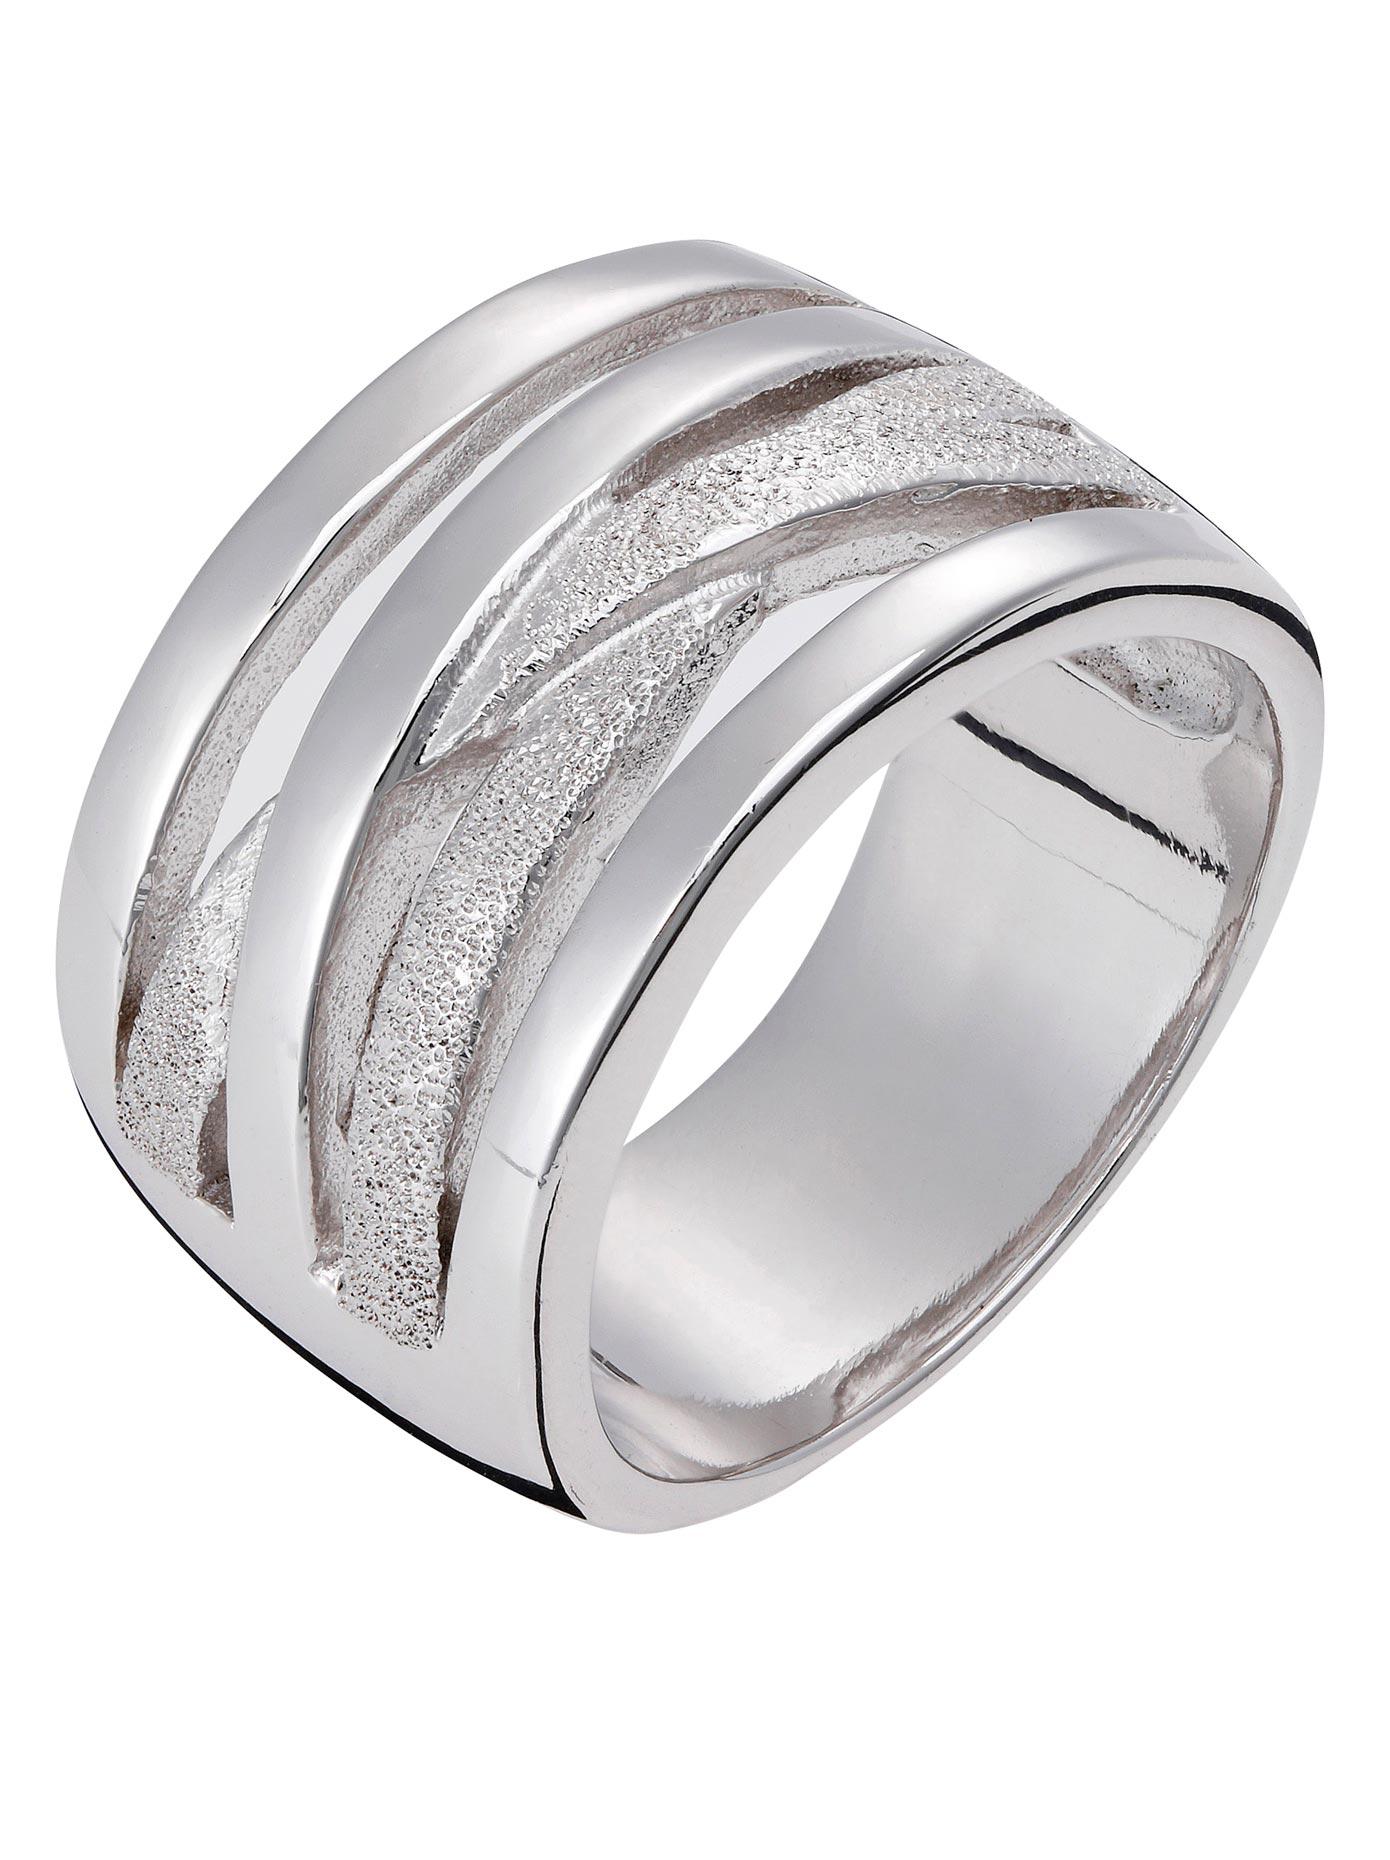 Lady Ring aus Silber   Schmuck > Ringe > Silberringe   Lady